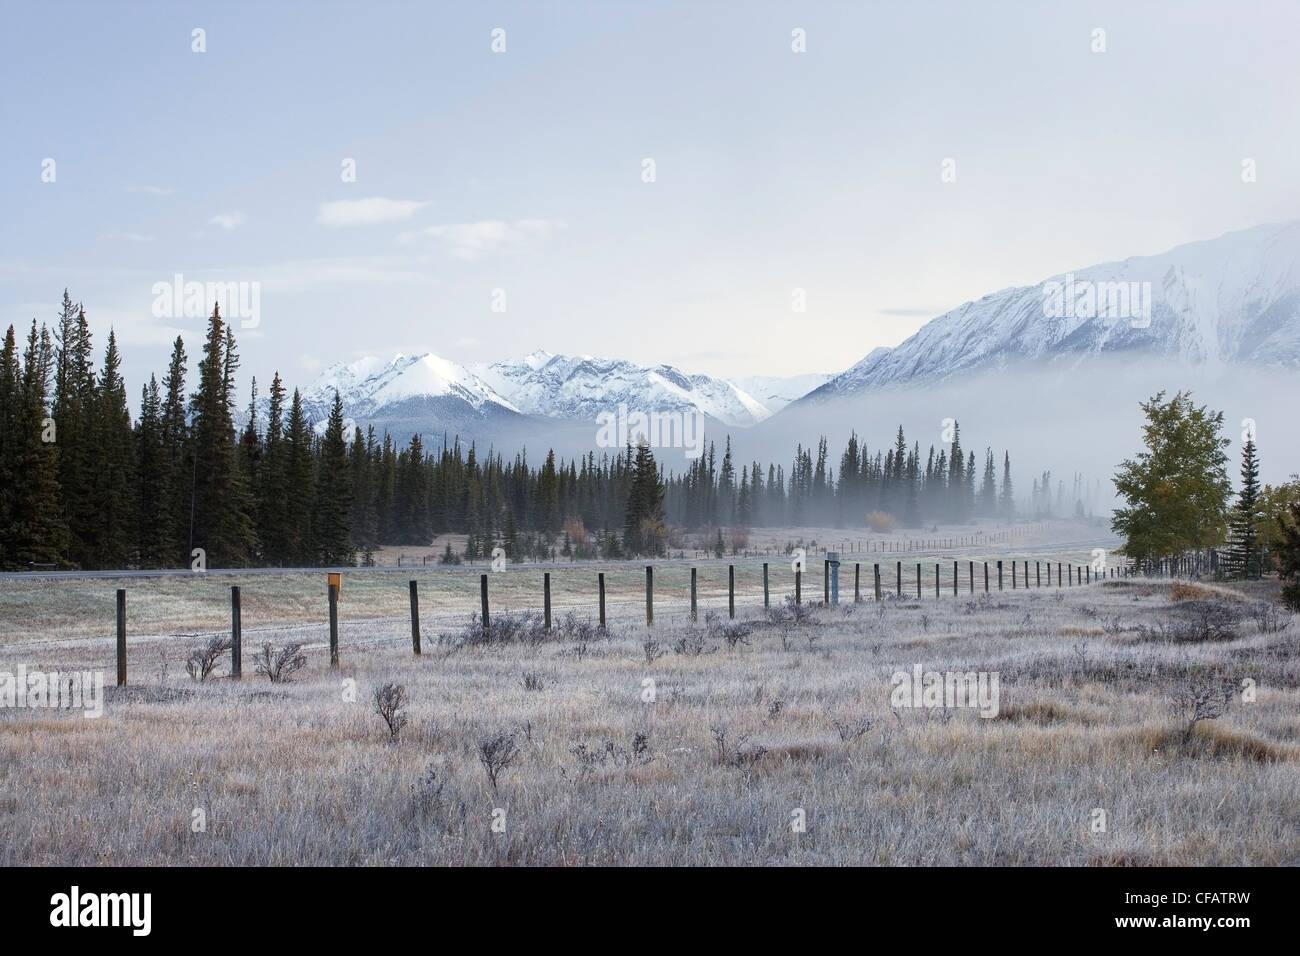 Fence line along the Kootenay Plains Ecological Reserve, Bighorn Wildlands, Alberta, Canada - Stock Image